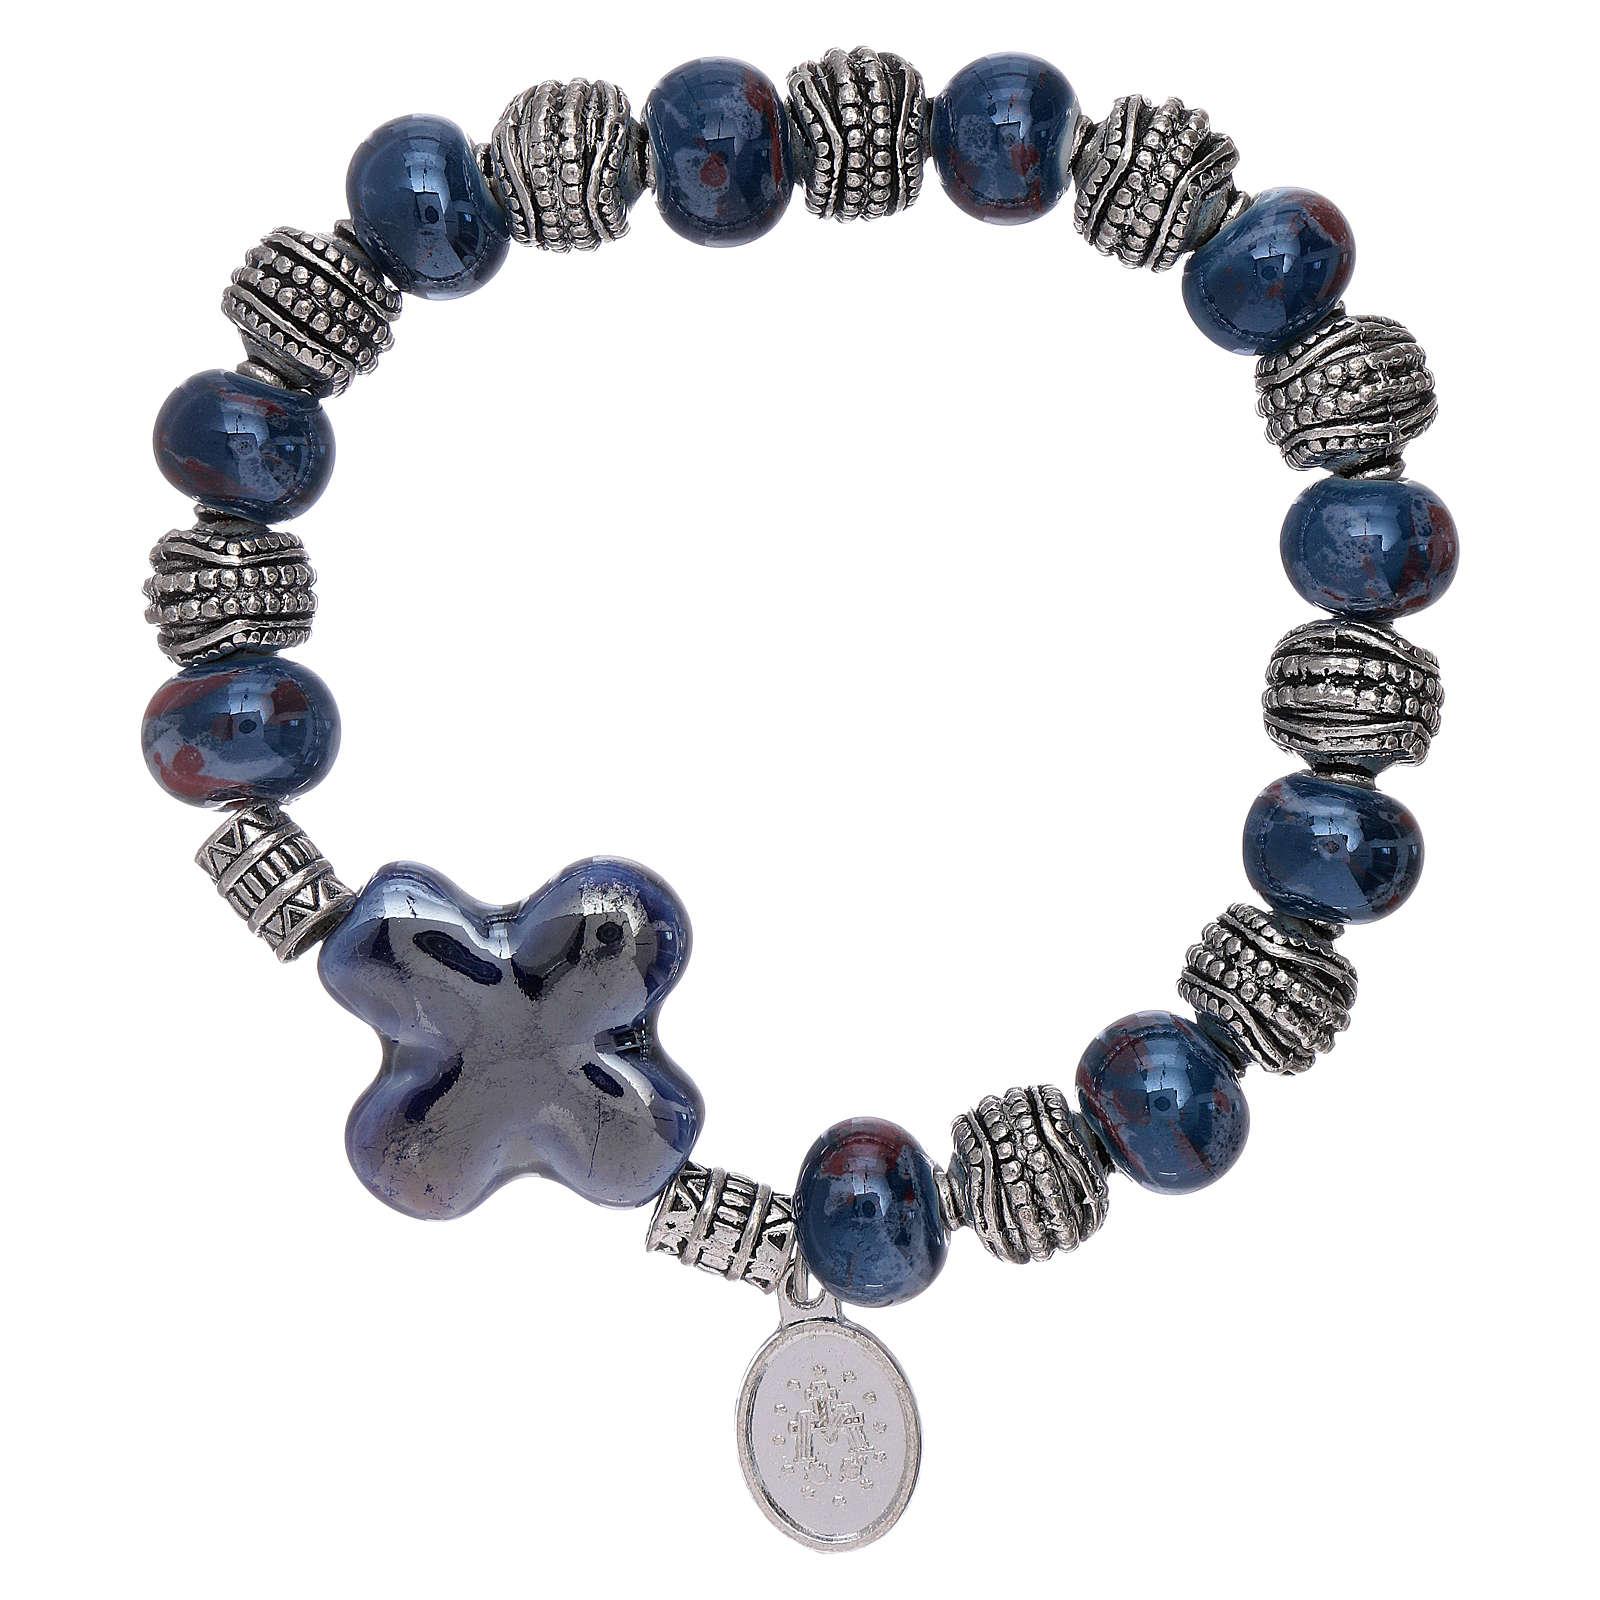 Elastic bracelet with ceramic grains 10x8 mm and blue cross 4